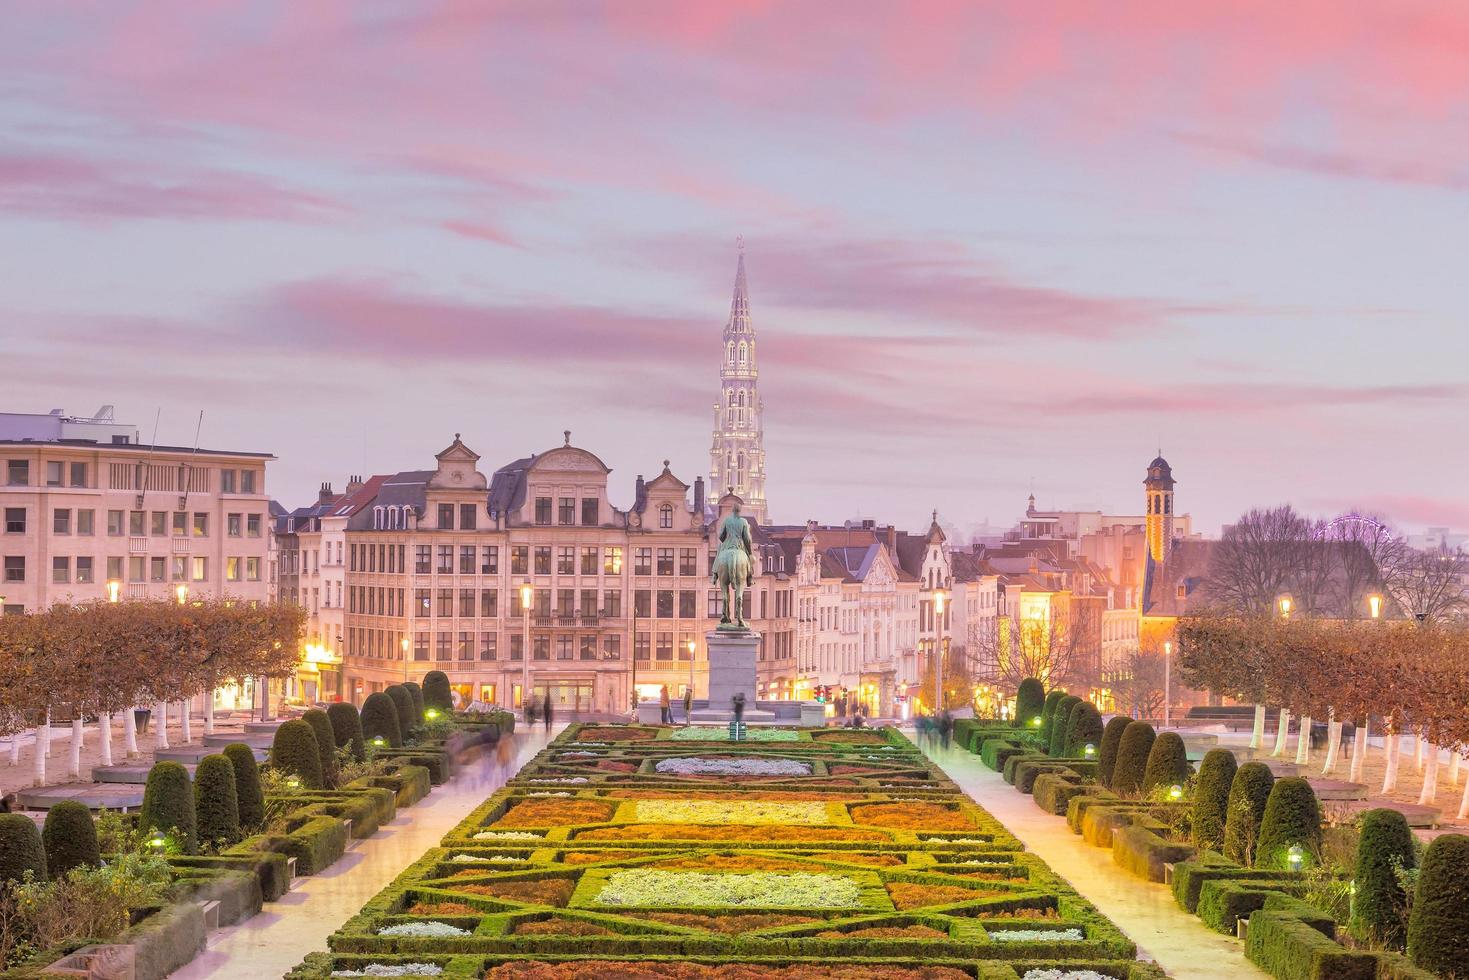 Bryssels stadsbild från monts des arts i skymningen foto